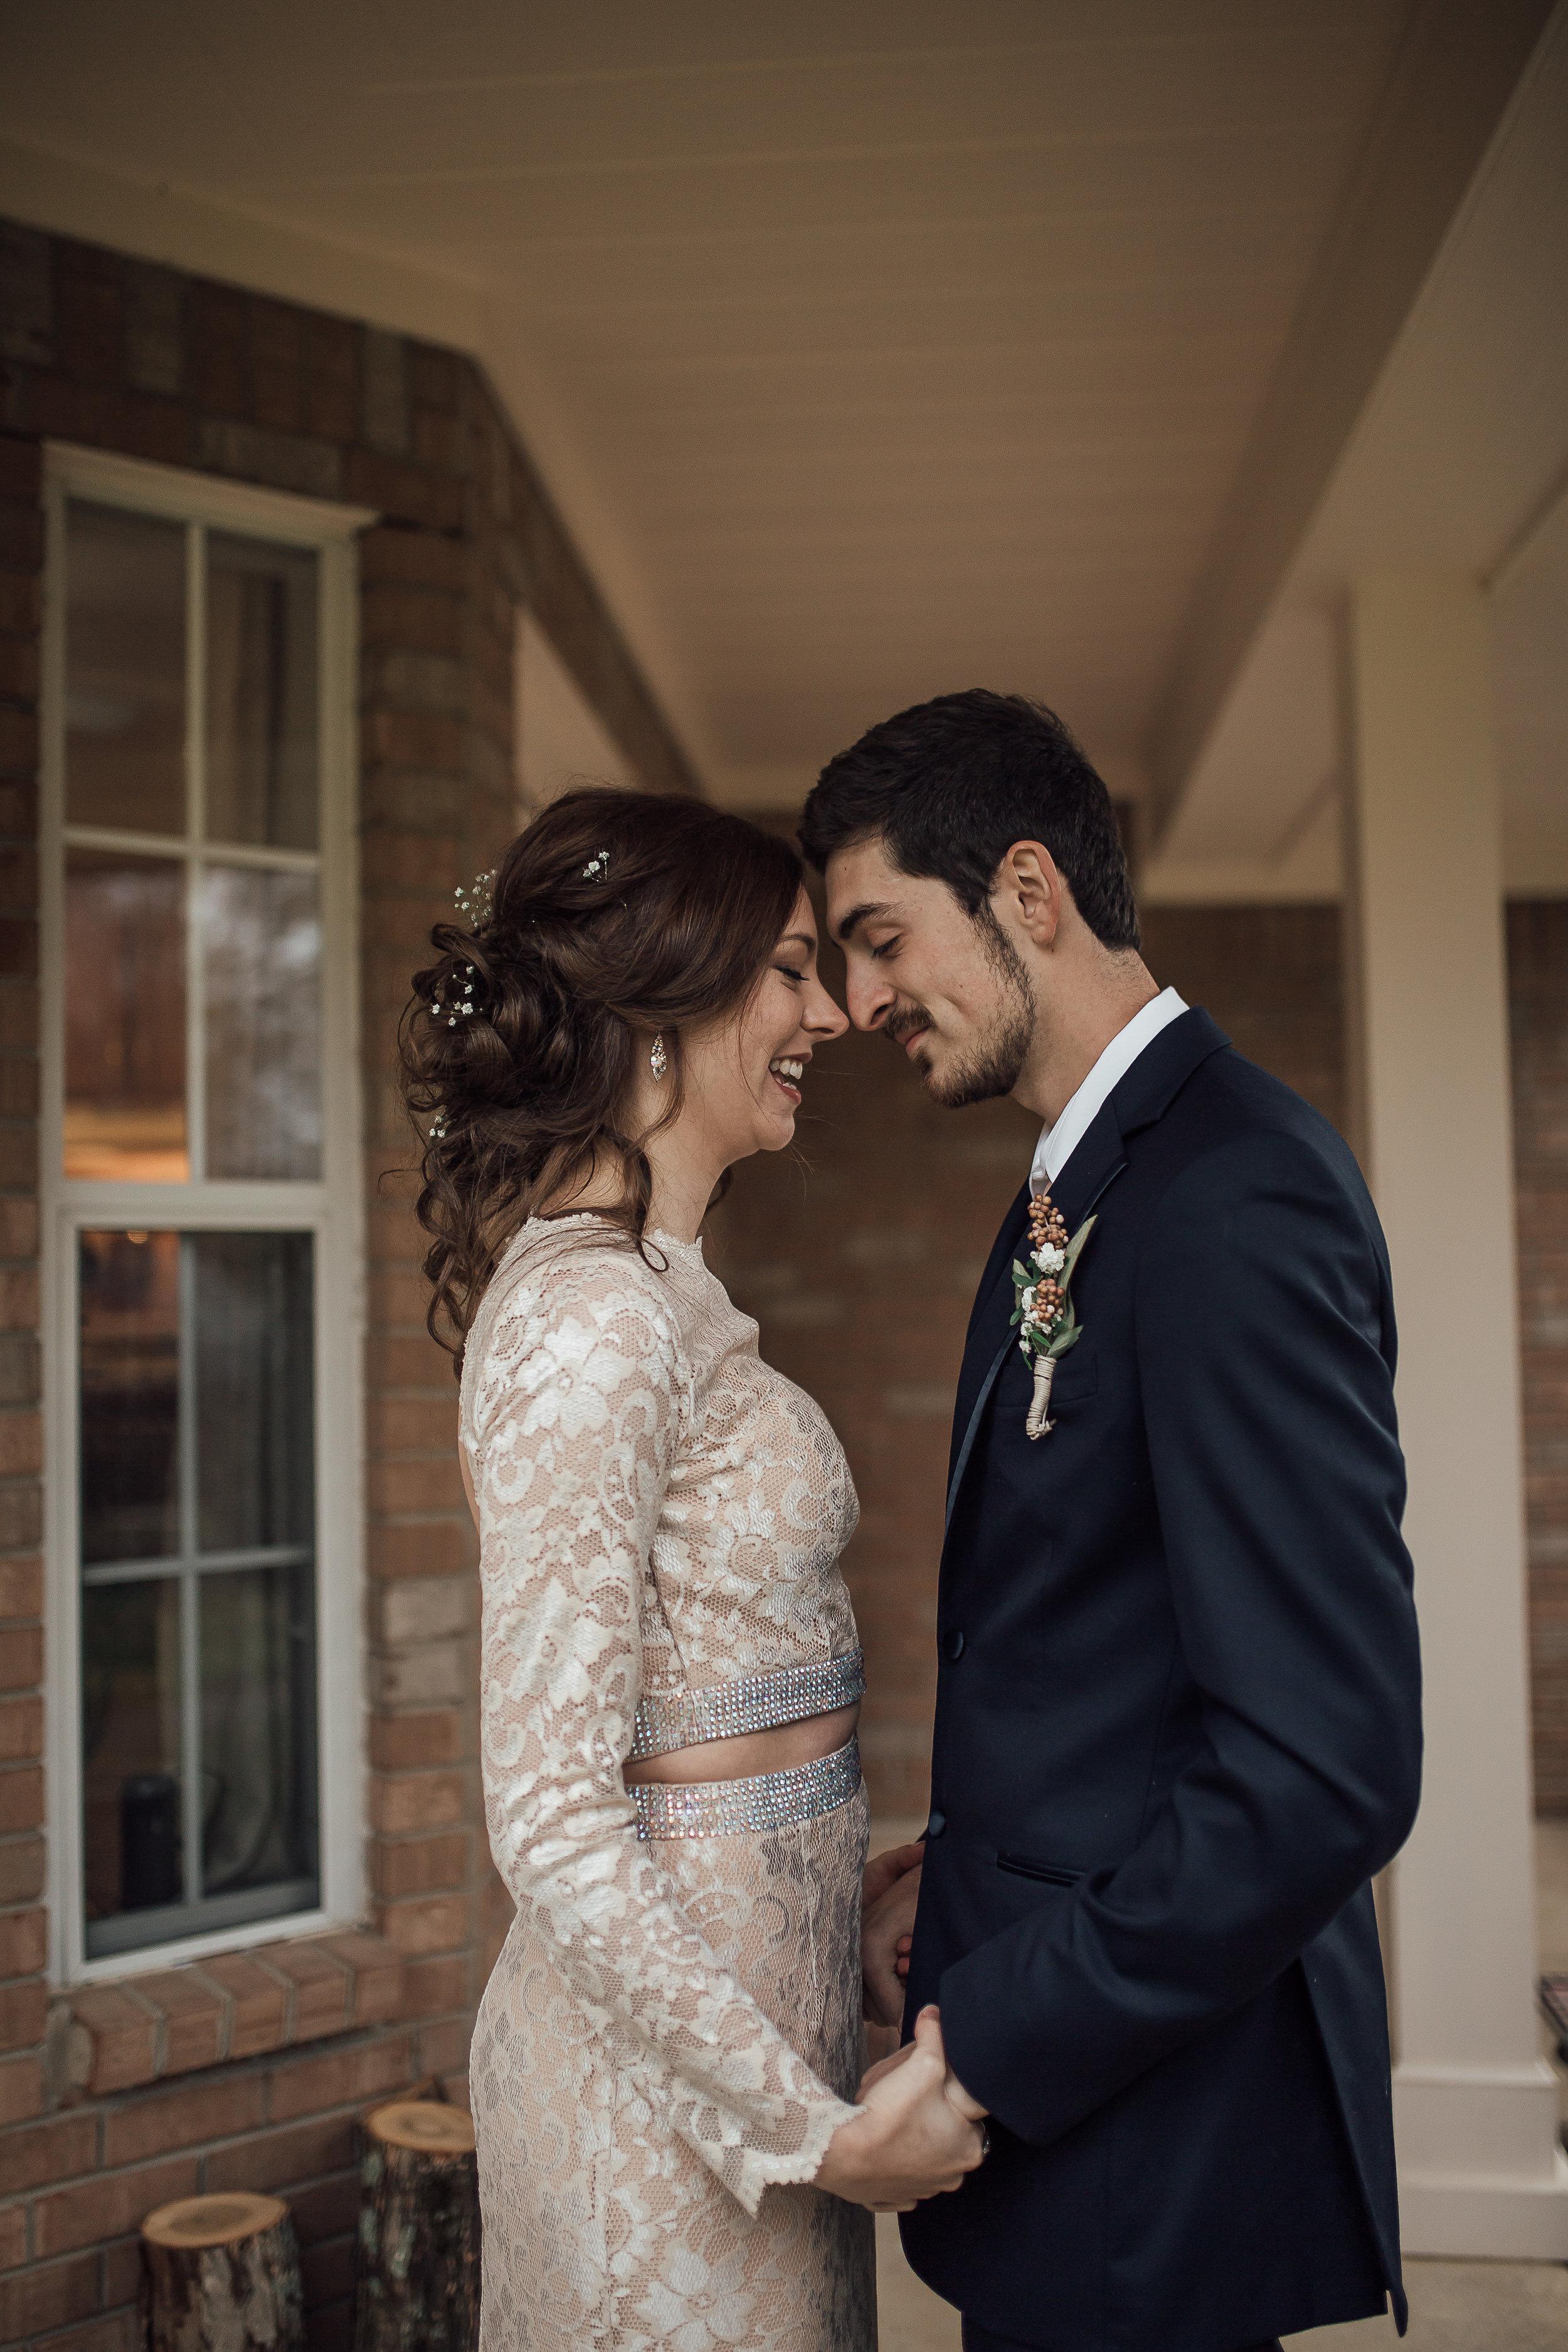 memphis-wedding-photographer-cassie-cook-photography-winter-wedding